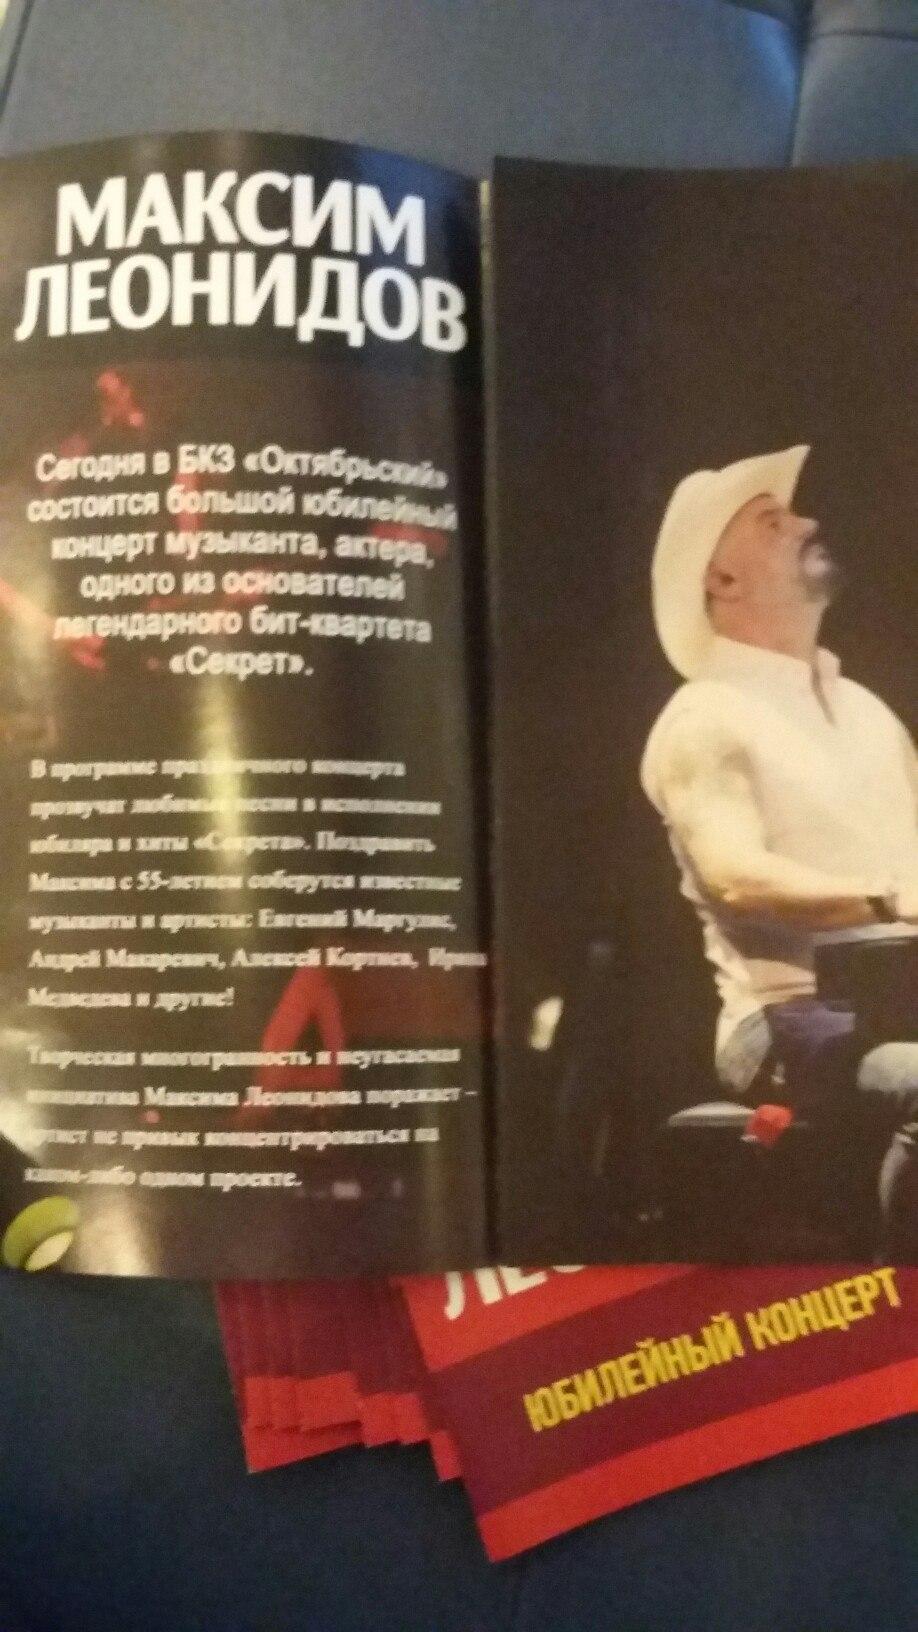 Фото напечатанной программки концерта Максима Леонидова 3